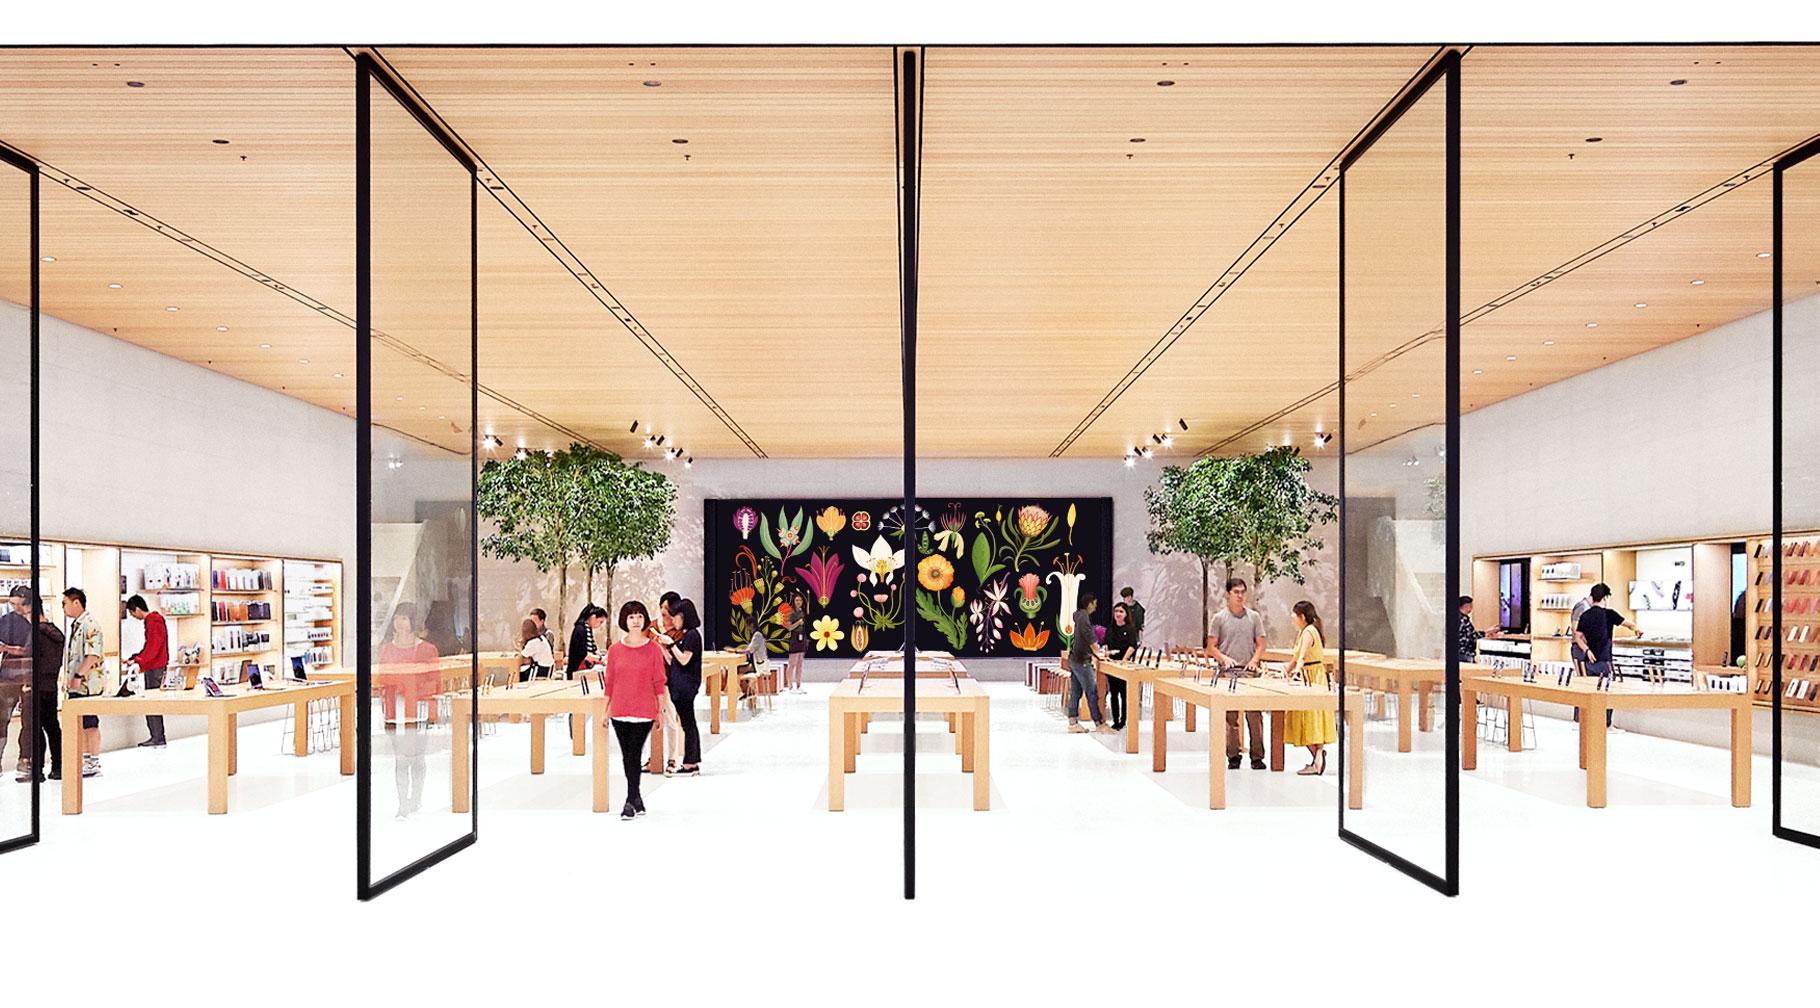 Apple Store interior